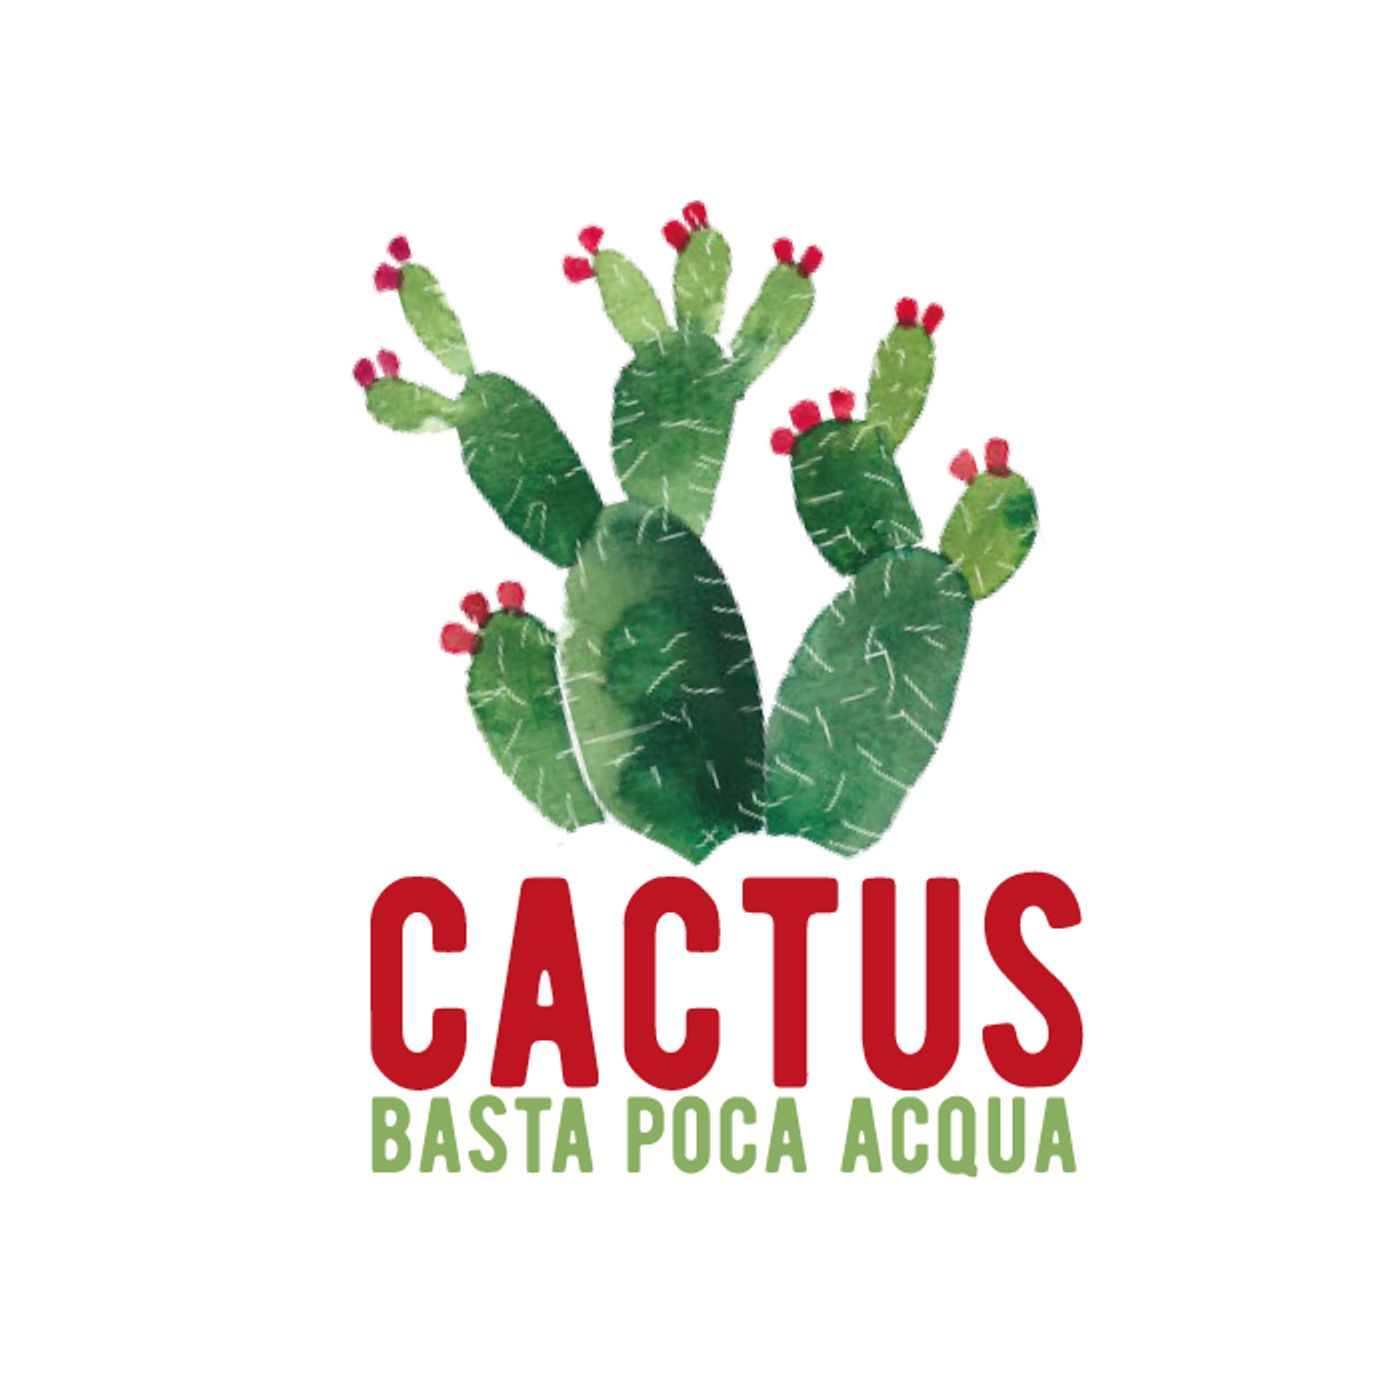 Cactus #35 - Todo Cambia - 27/05/2021